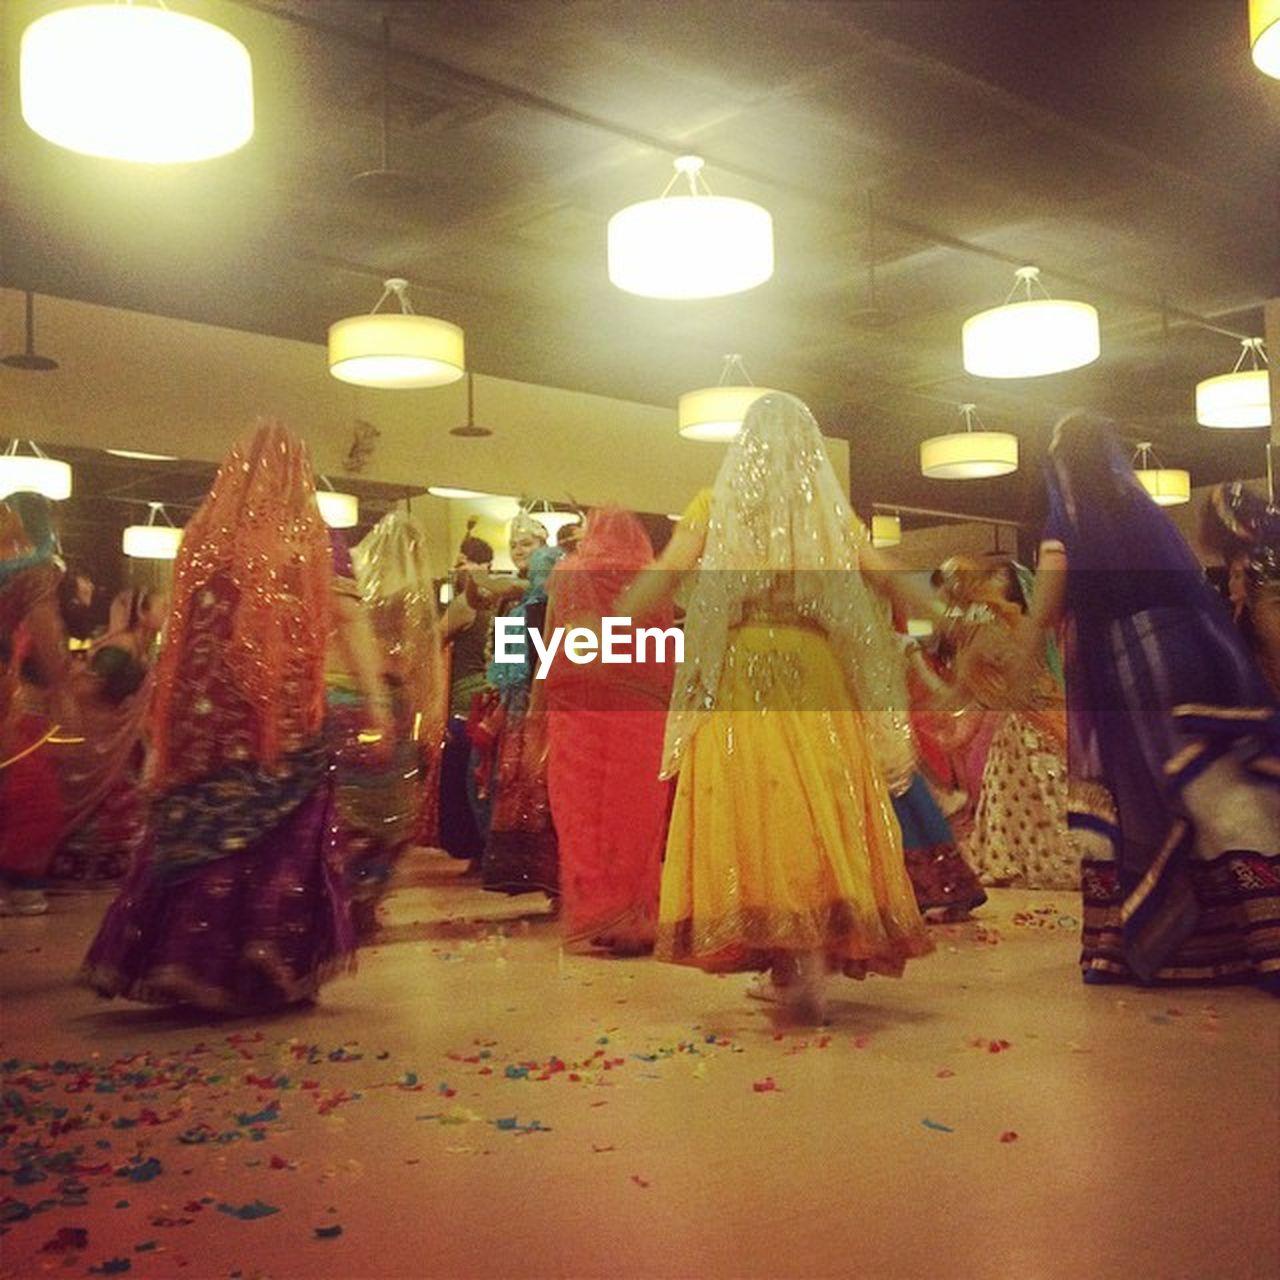 illuminated, indoors, celebration, men, retail, night, real people, large group of people, bride, women, wedding dress, people